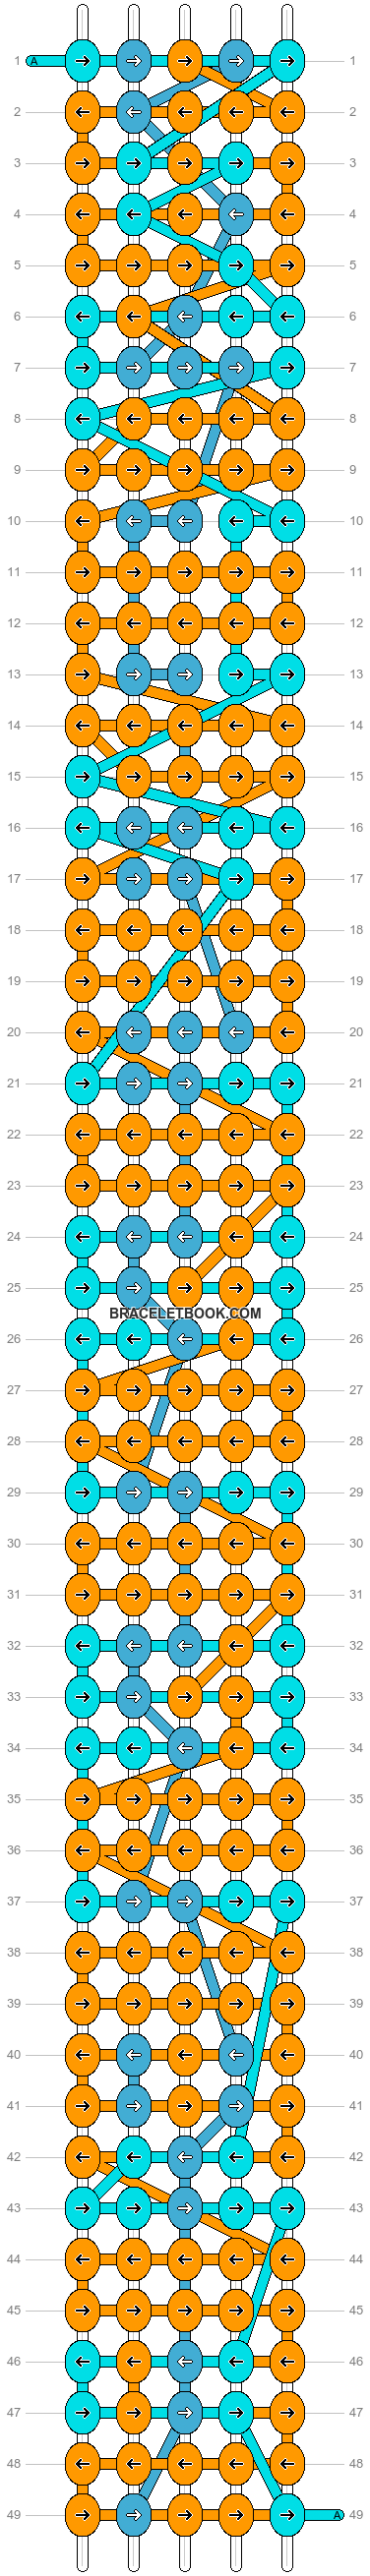 Alpha pattern #7186 pattern